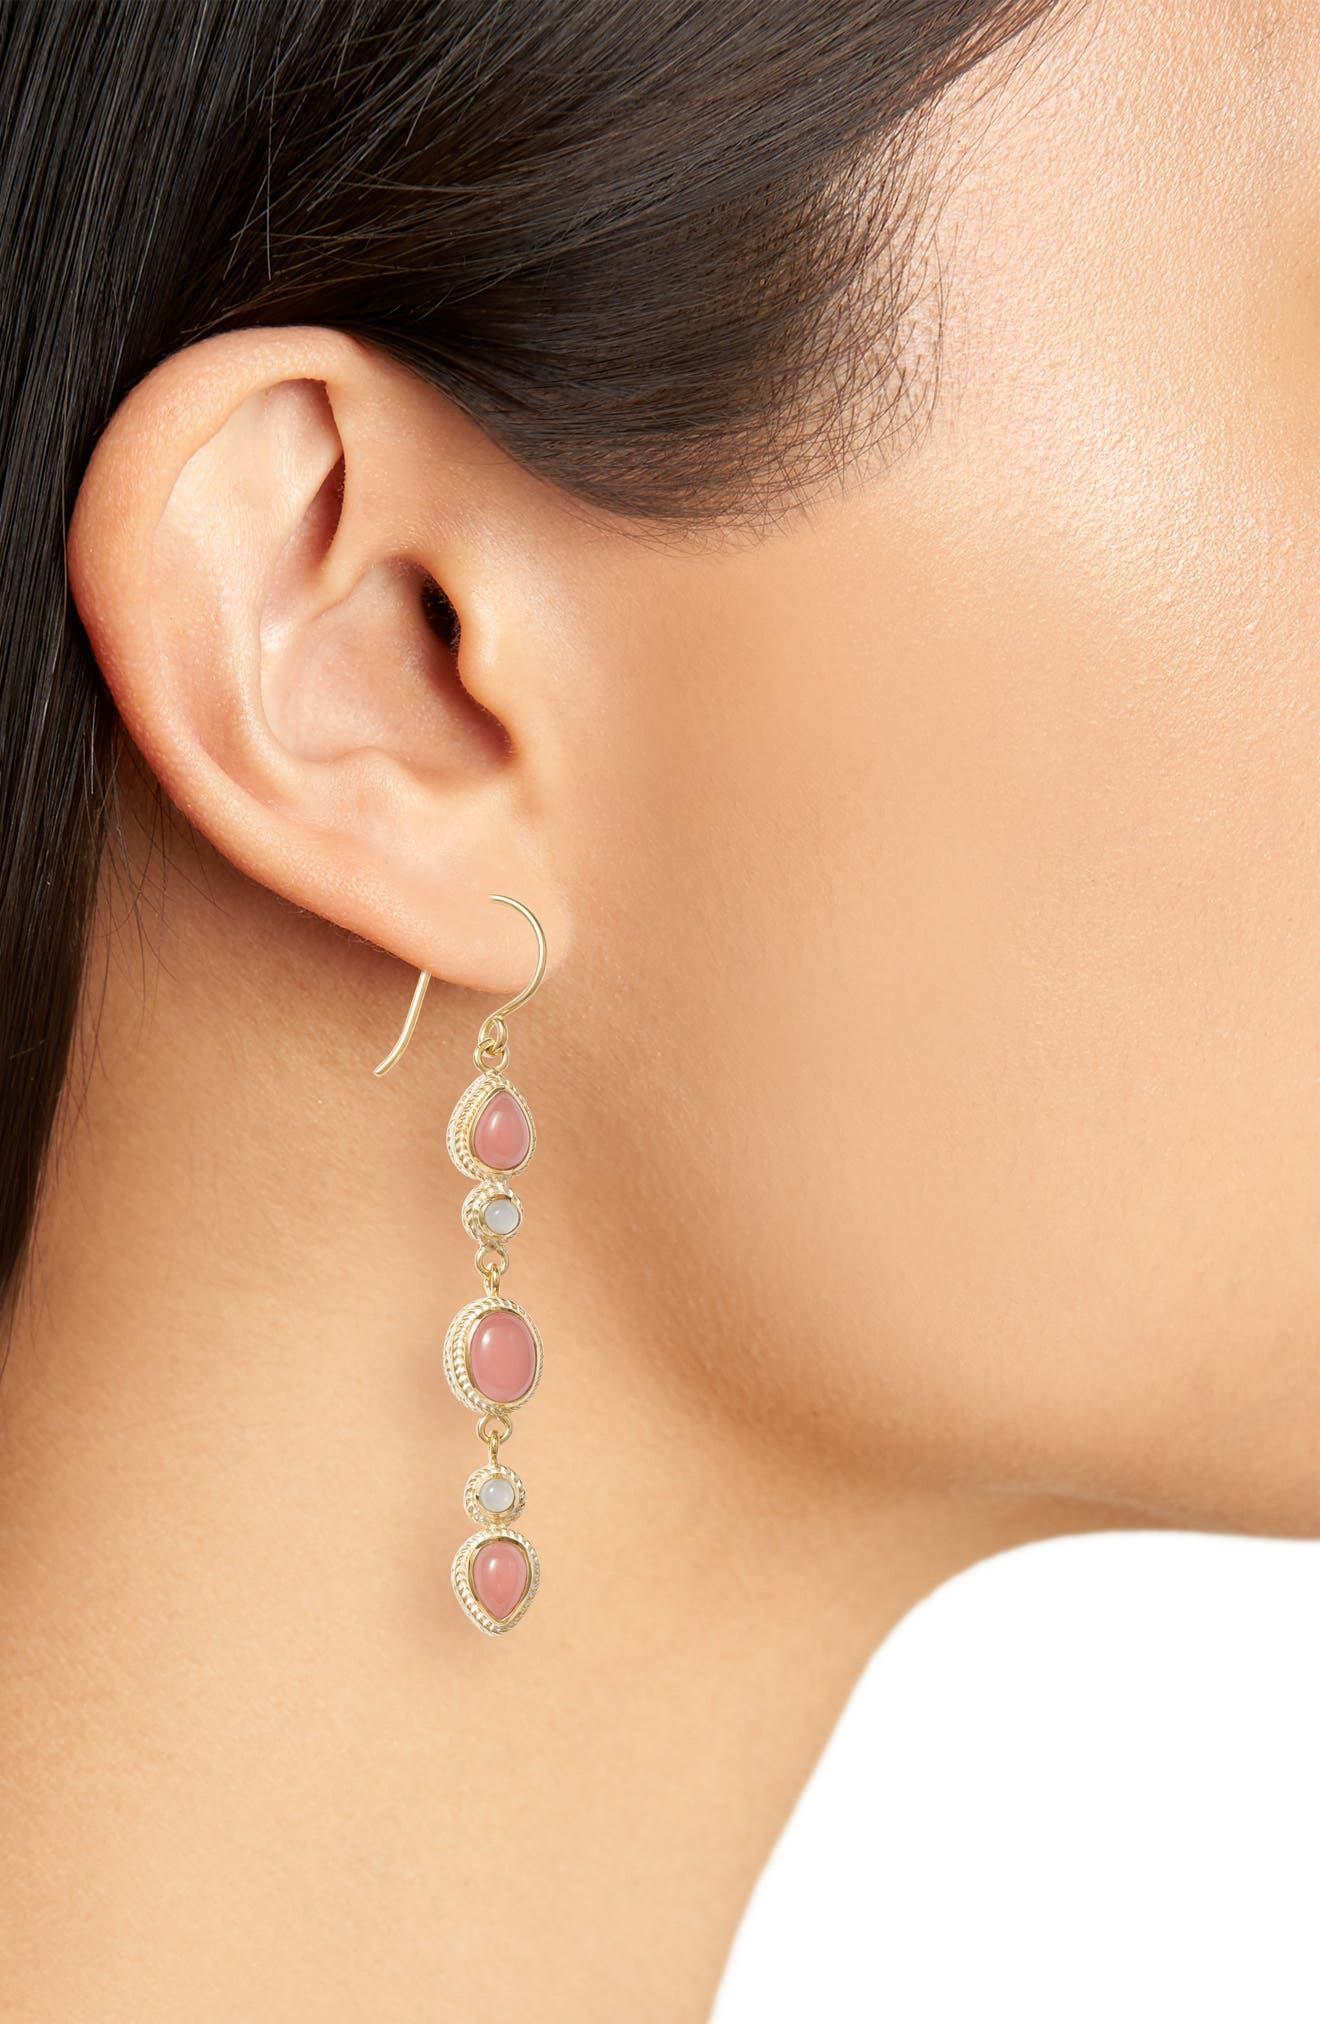 Guava Quartz & Moonstone Linear Drop Earrings,                             Alternate thumbnail 2, color,                             Gold/ Guava/ Moonstone